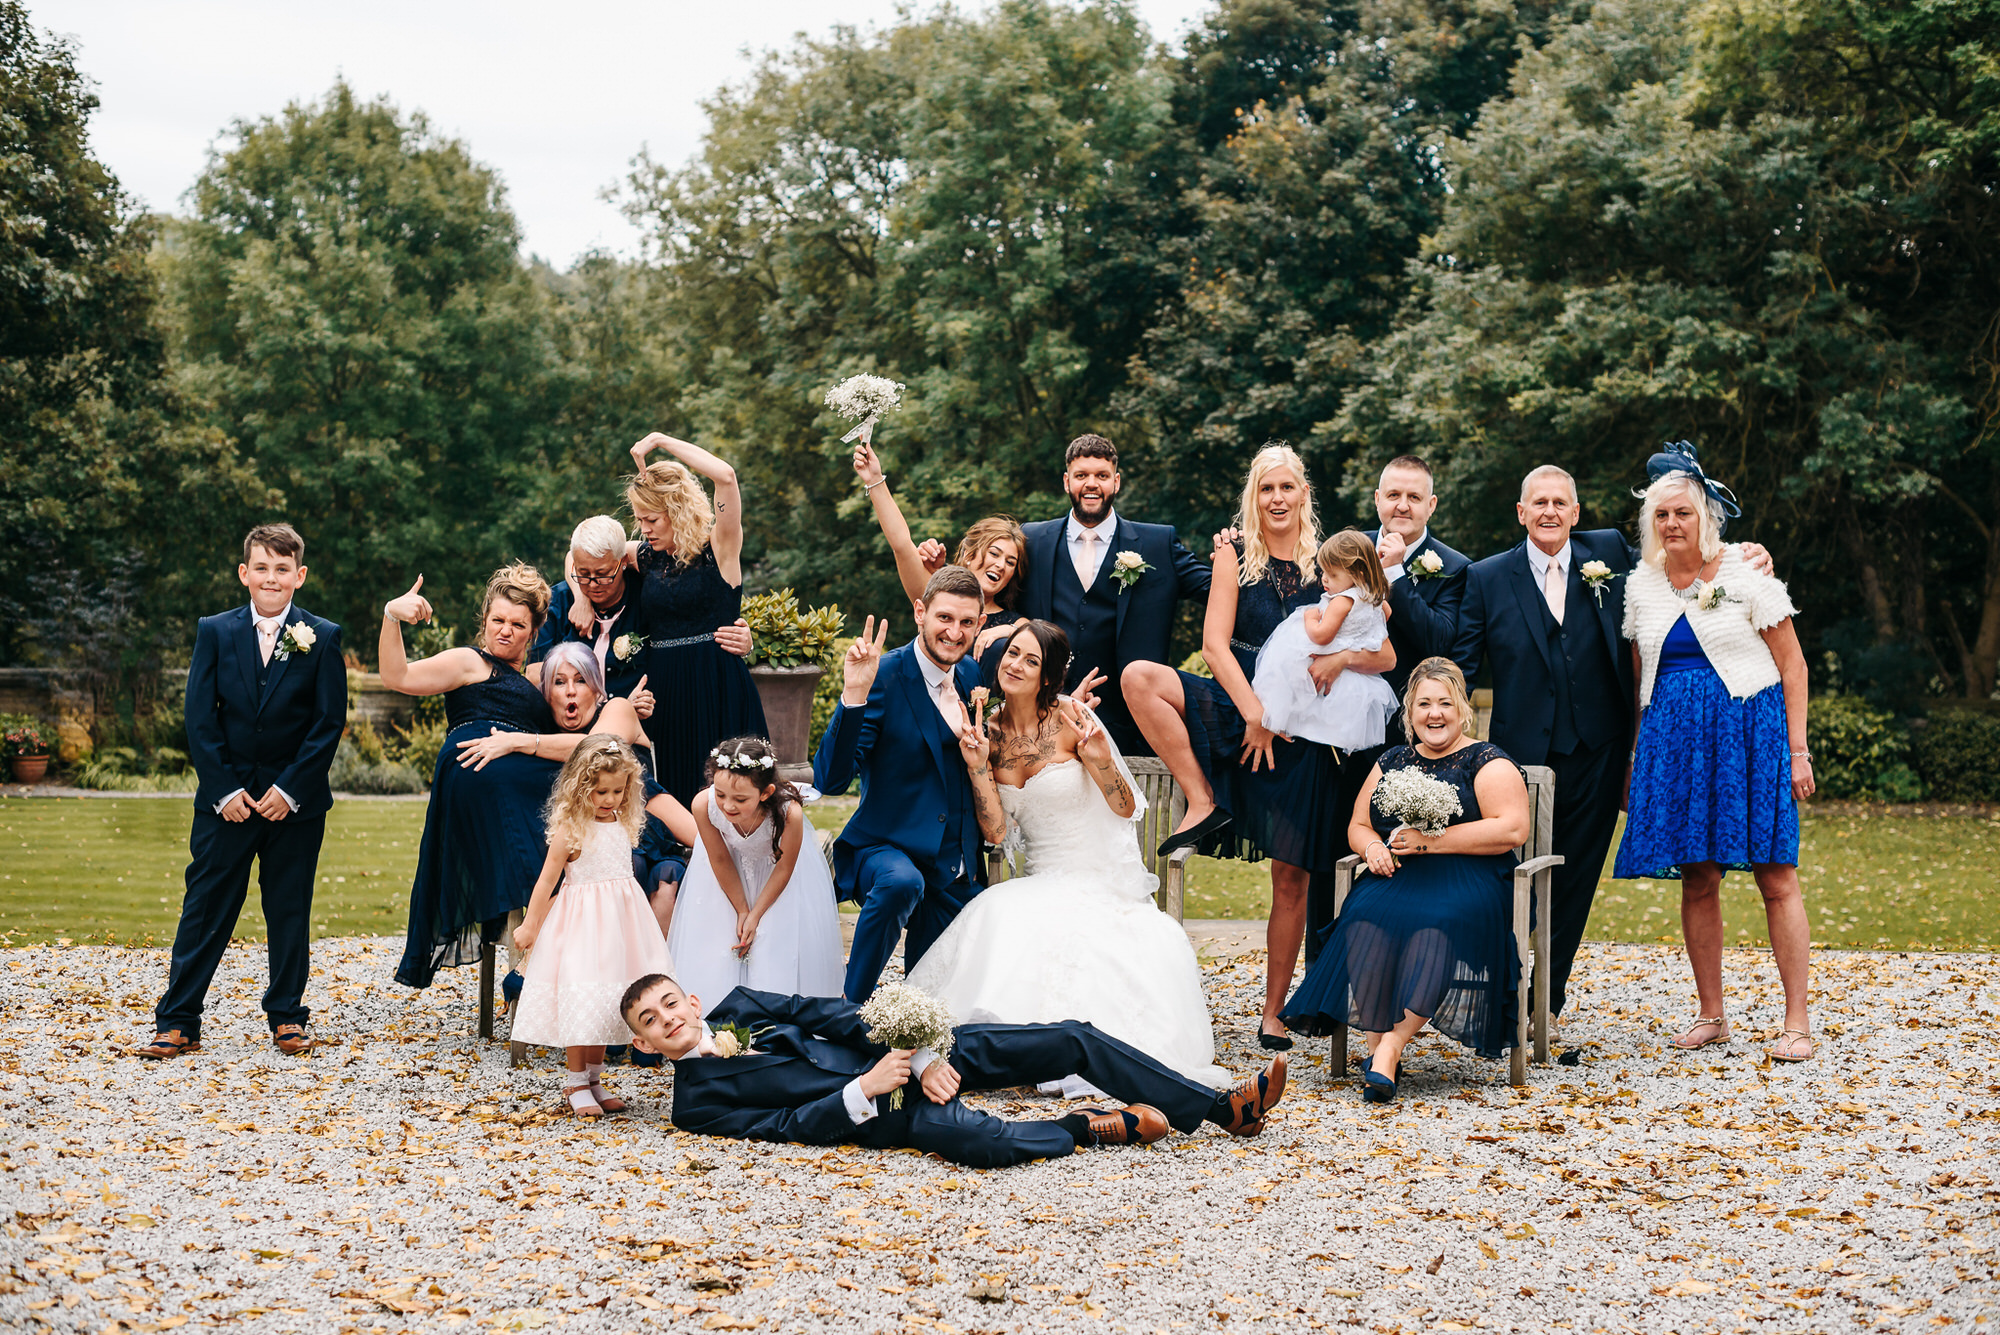 Best Of Yorkshire Wedding Photography 2017 - Martyn Hand-19.jpg